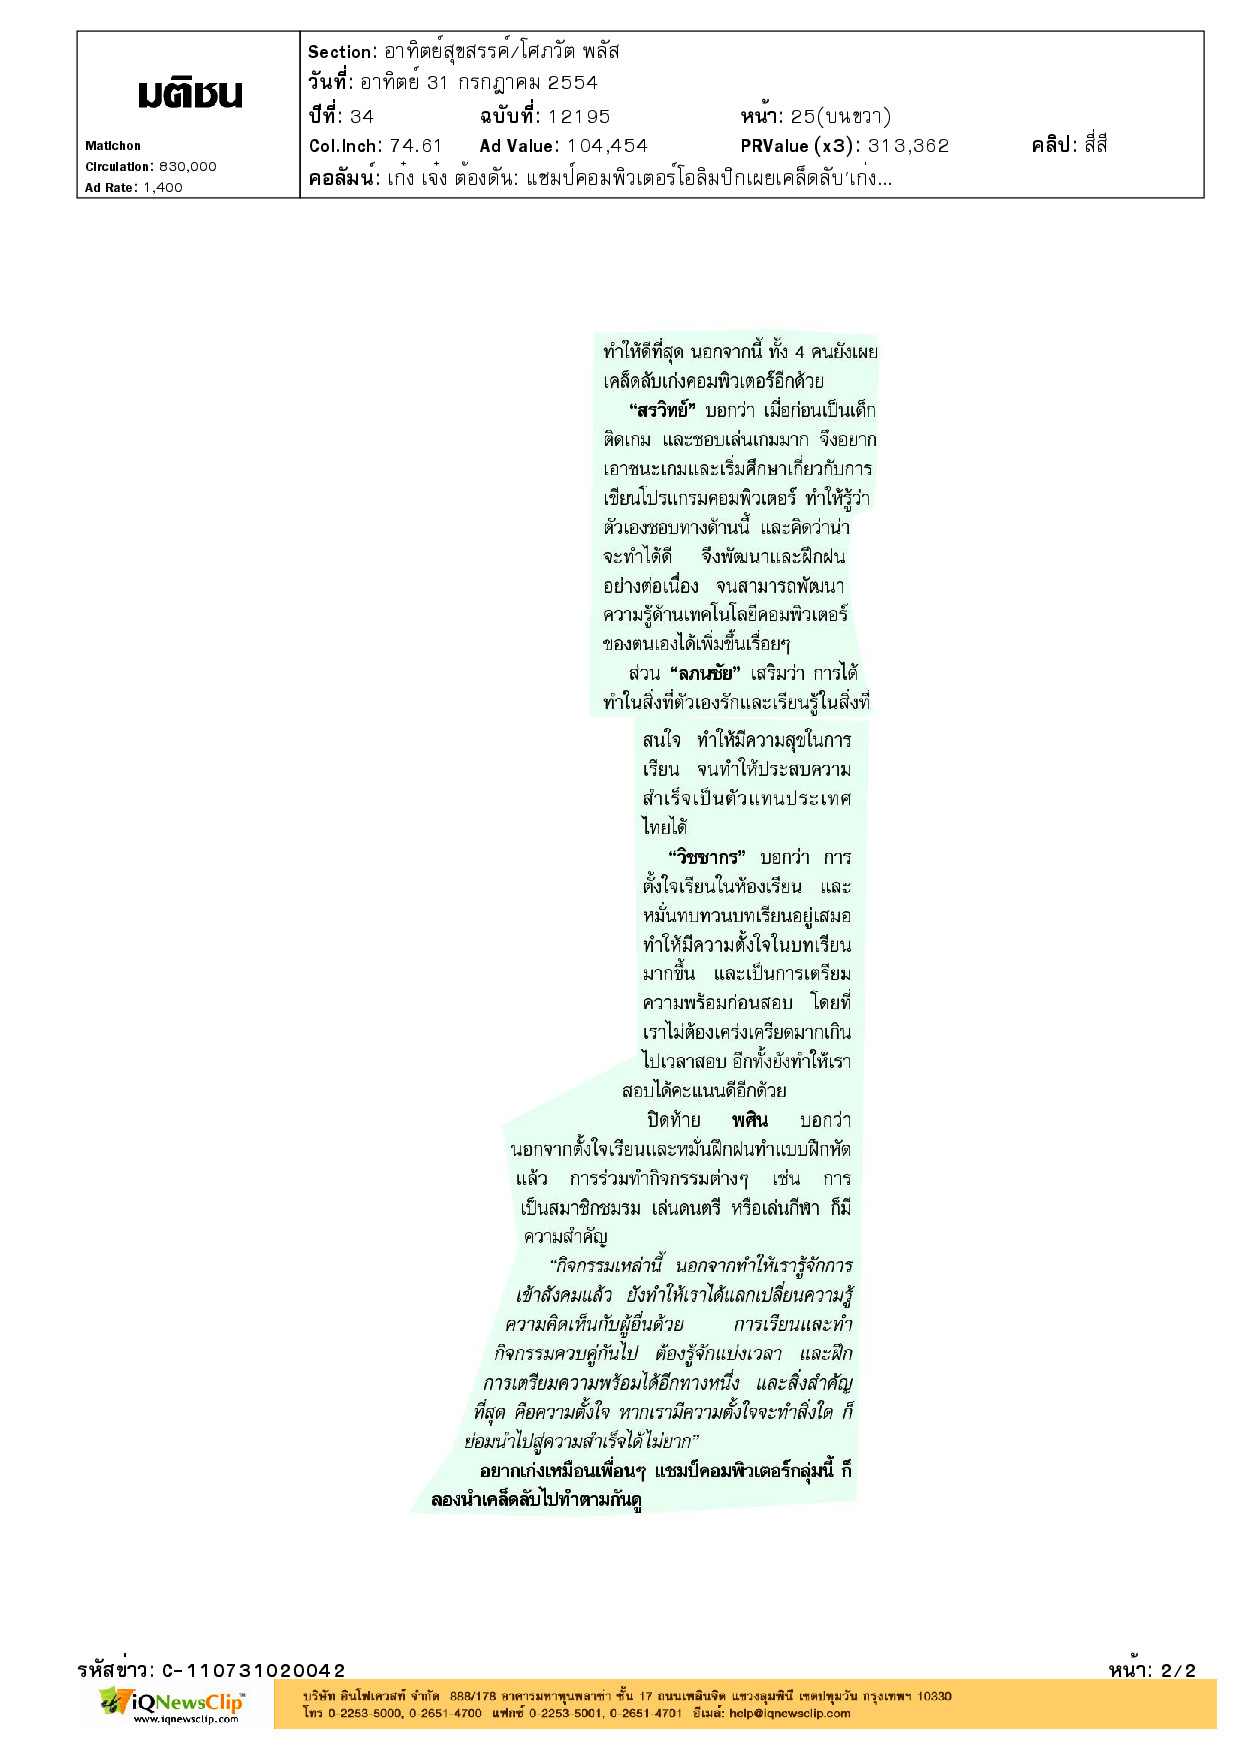 C-110731020042.pdf-1